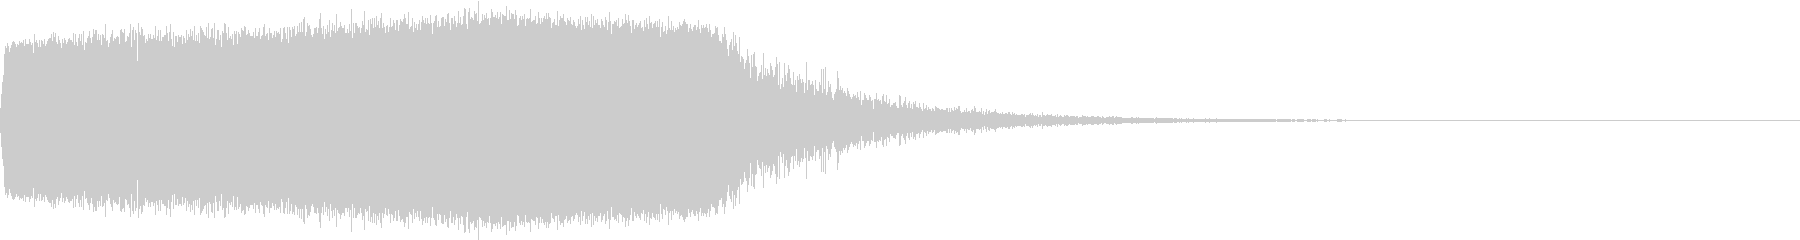 TVFX クイズ出題前 上昇 キュイーンの未再生の波形